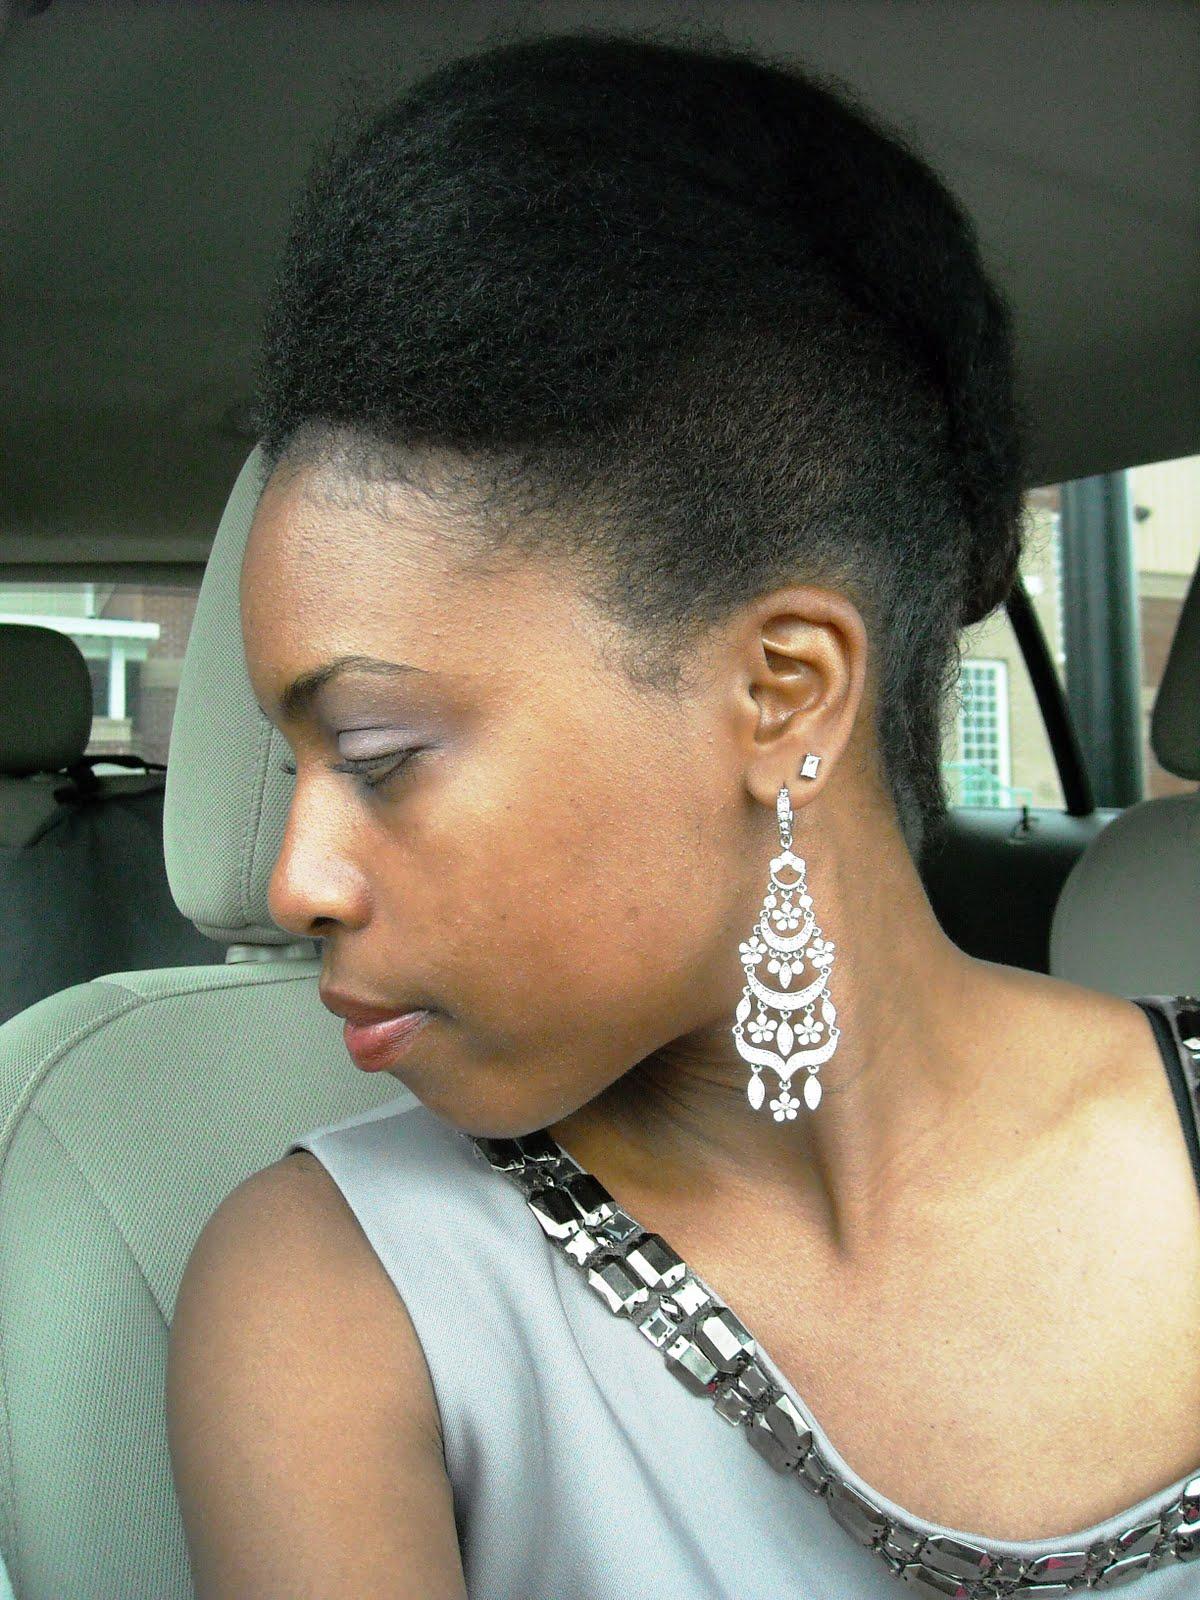 Wondrous Tiashauntee Naturally Glam Hair Idol Curlynikki Natural Hair Care Short Hairstyles For Black Women Fulllsitofus